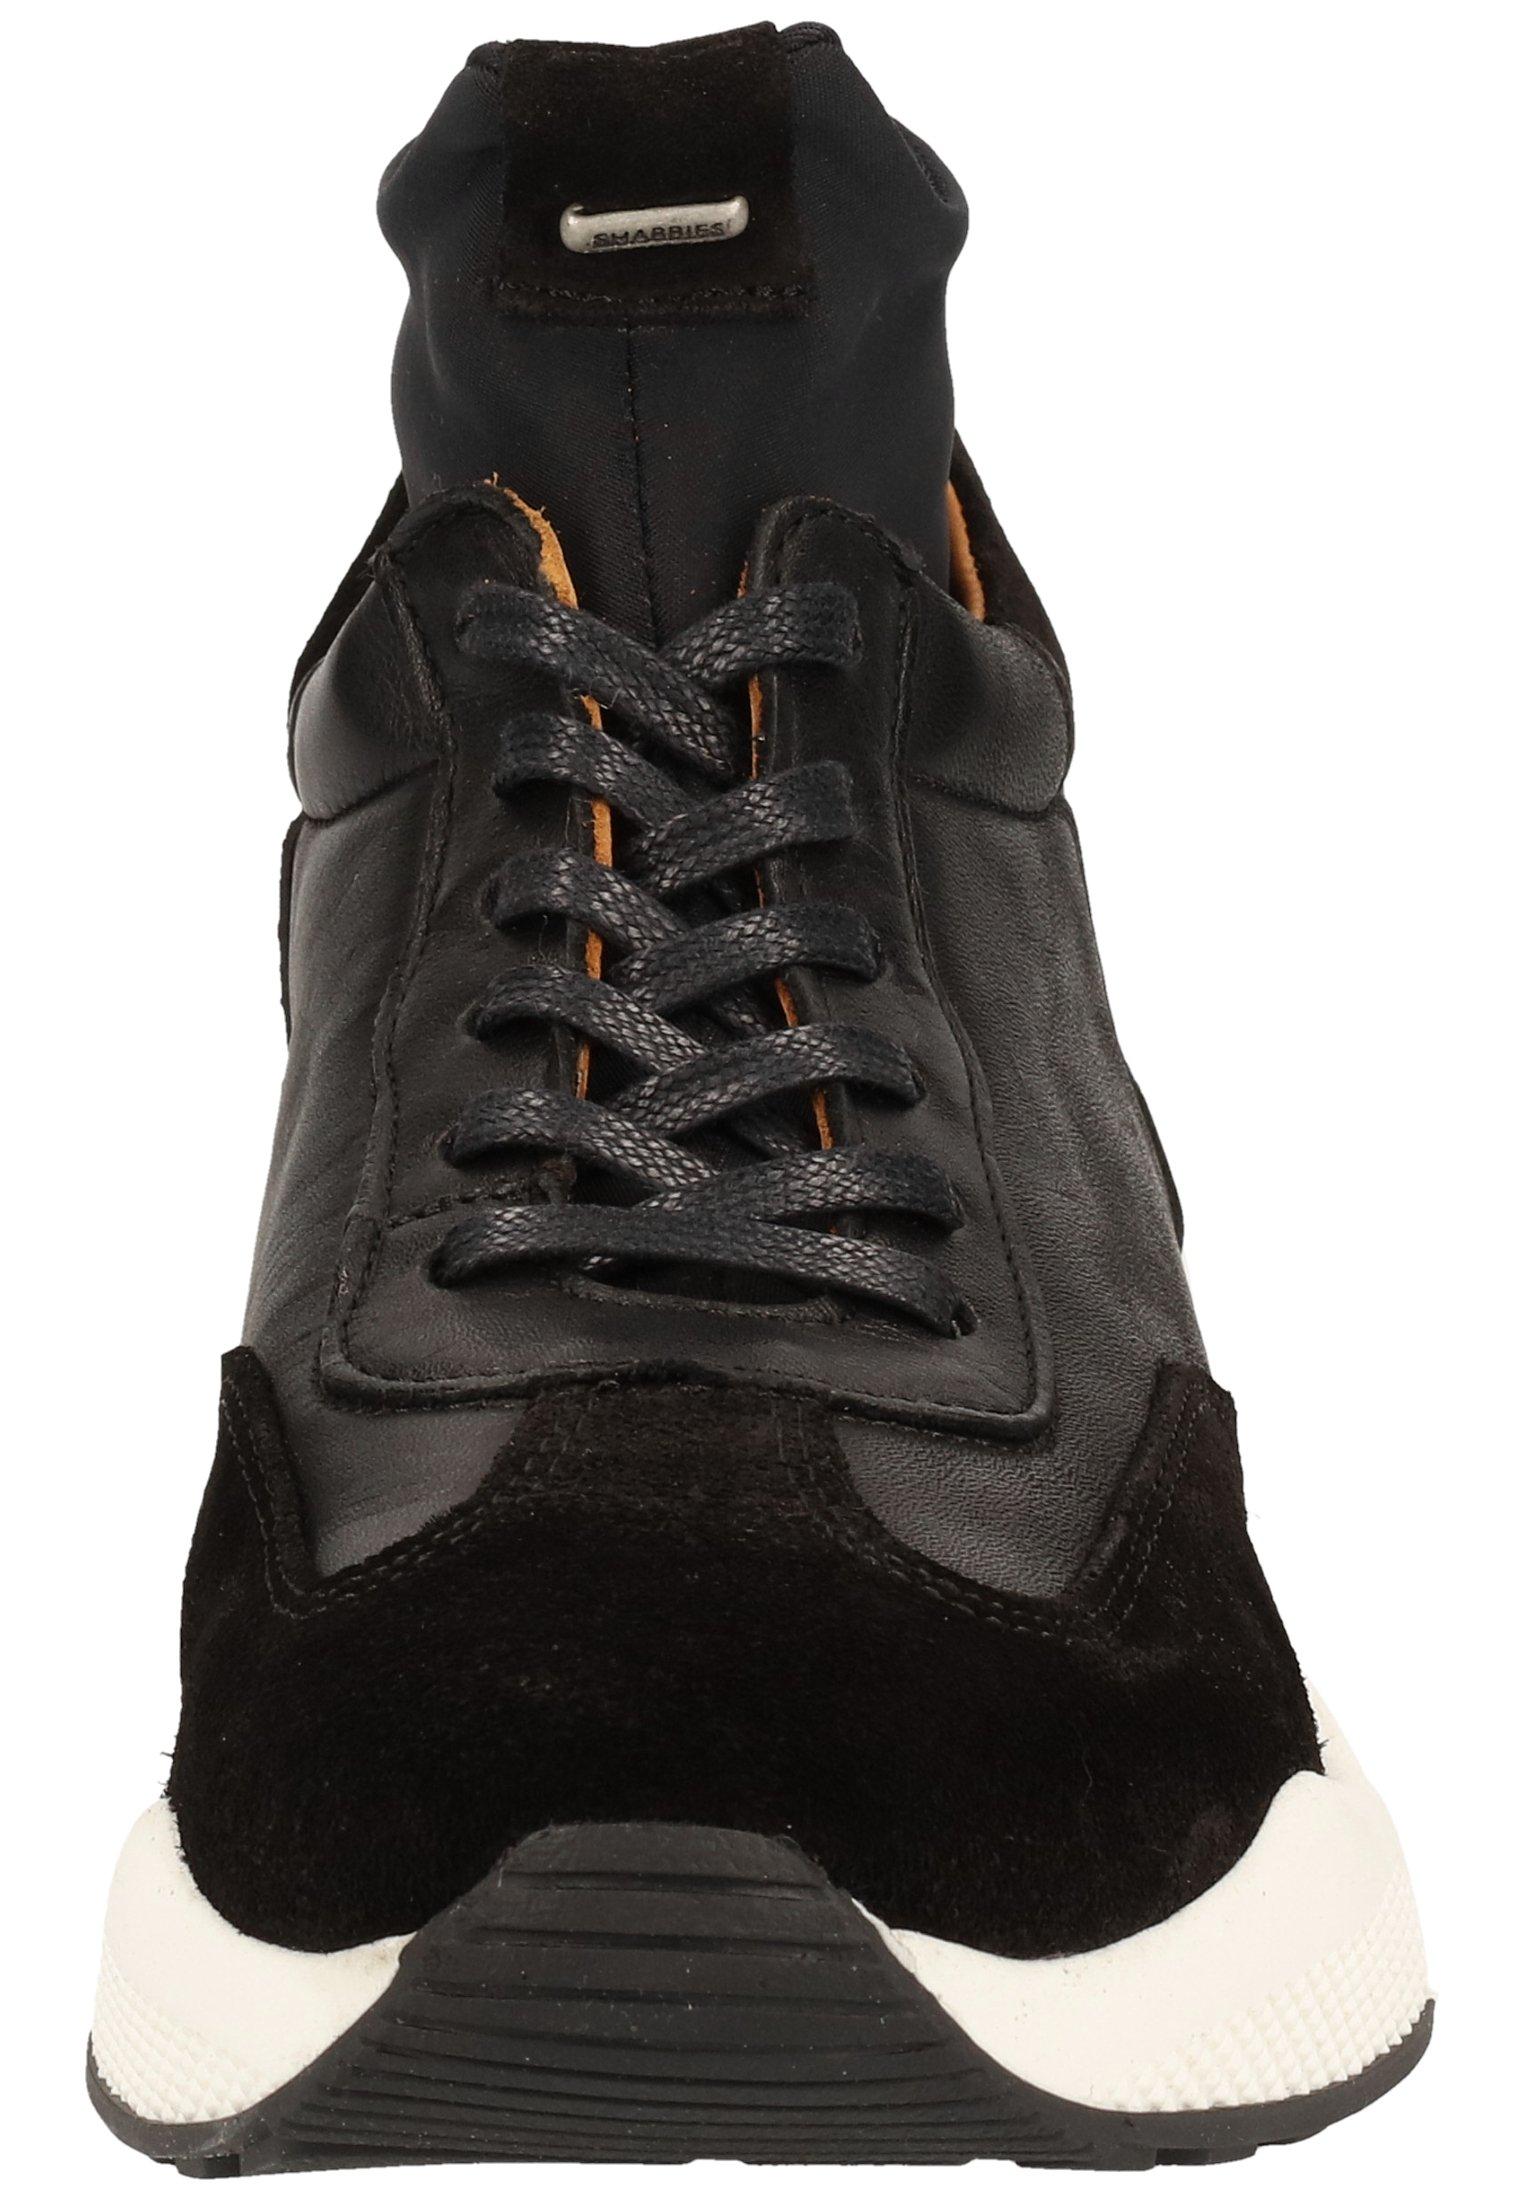 Shabbies Amsterdam Sneaker high - black - Black Friday